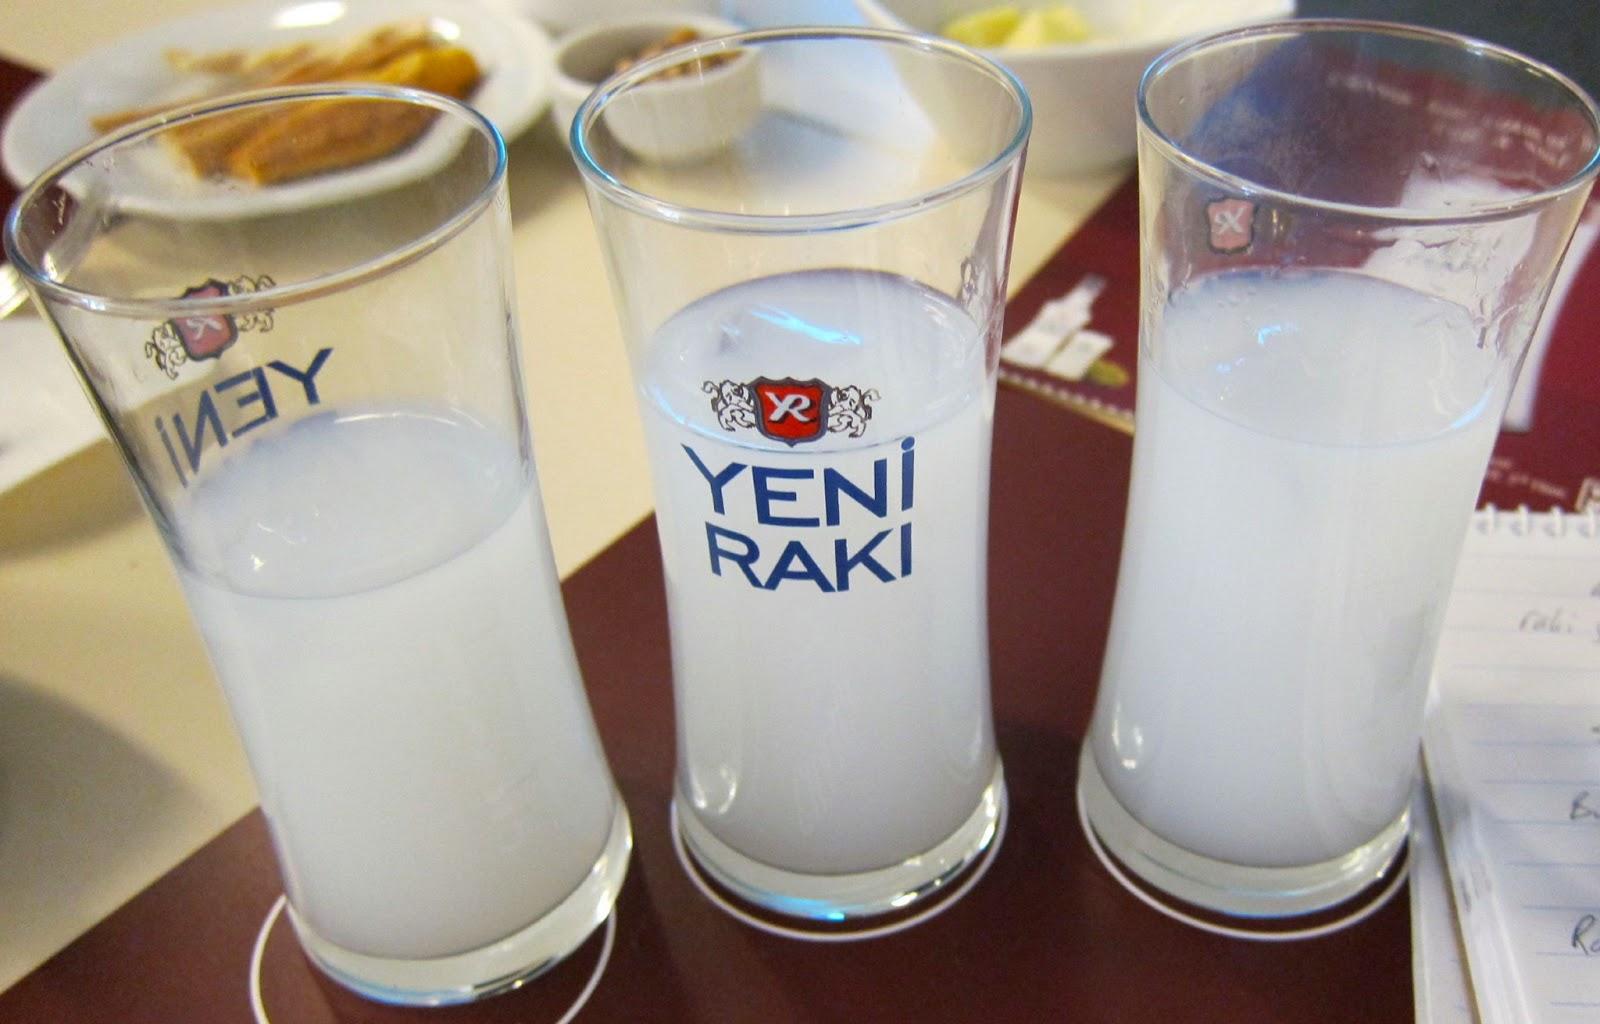 Yeni Raki 12x 5cl Miniature Pack - DrinkSupermarket |Raki Turkish Drink